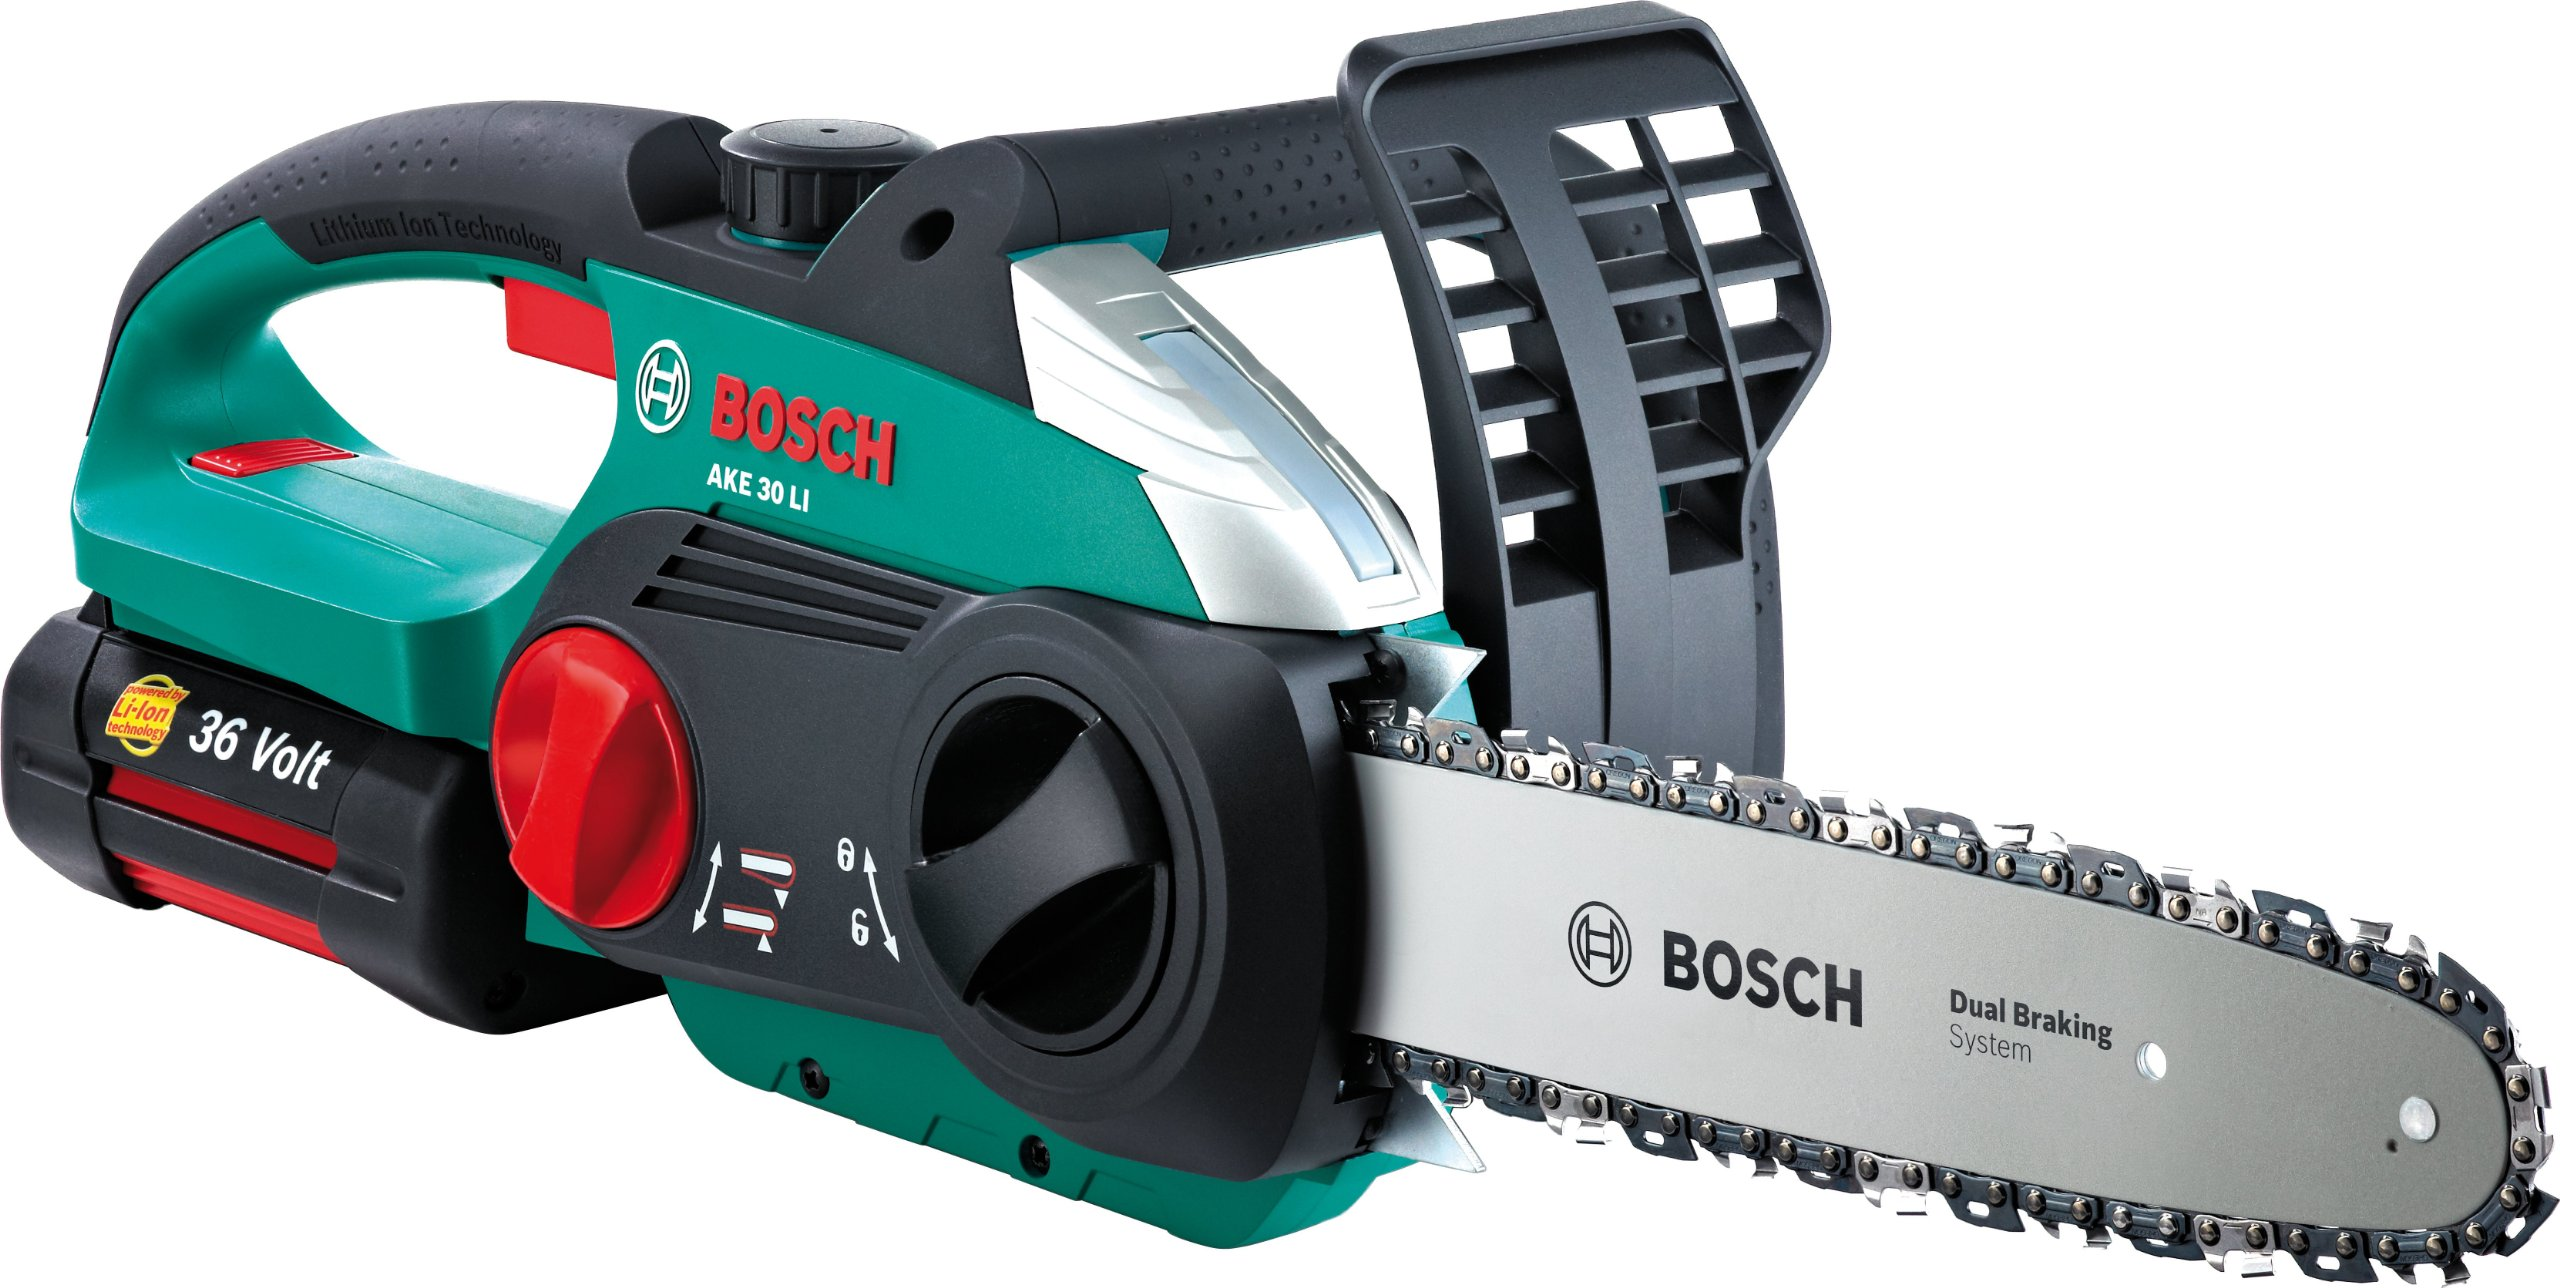 Bosch-AKE-30-Li-36v-Akku-Kettensge-30cm-Schwertlnge